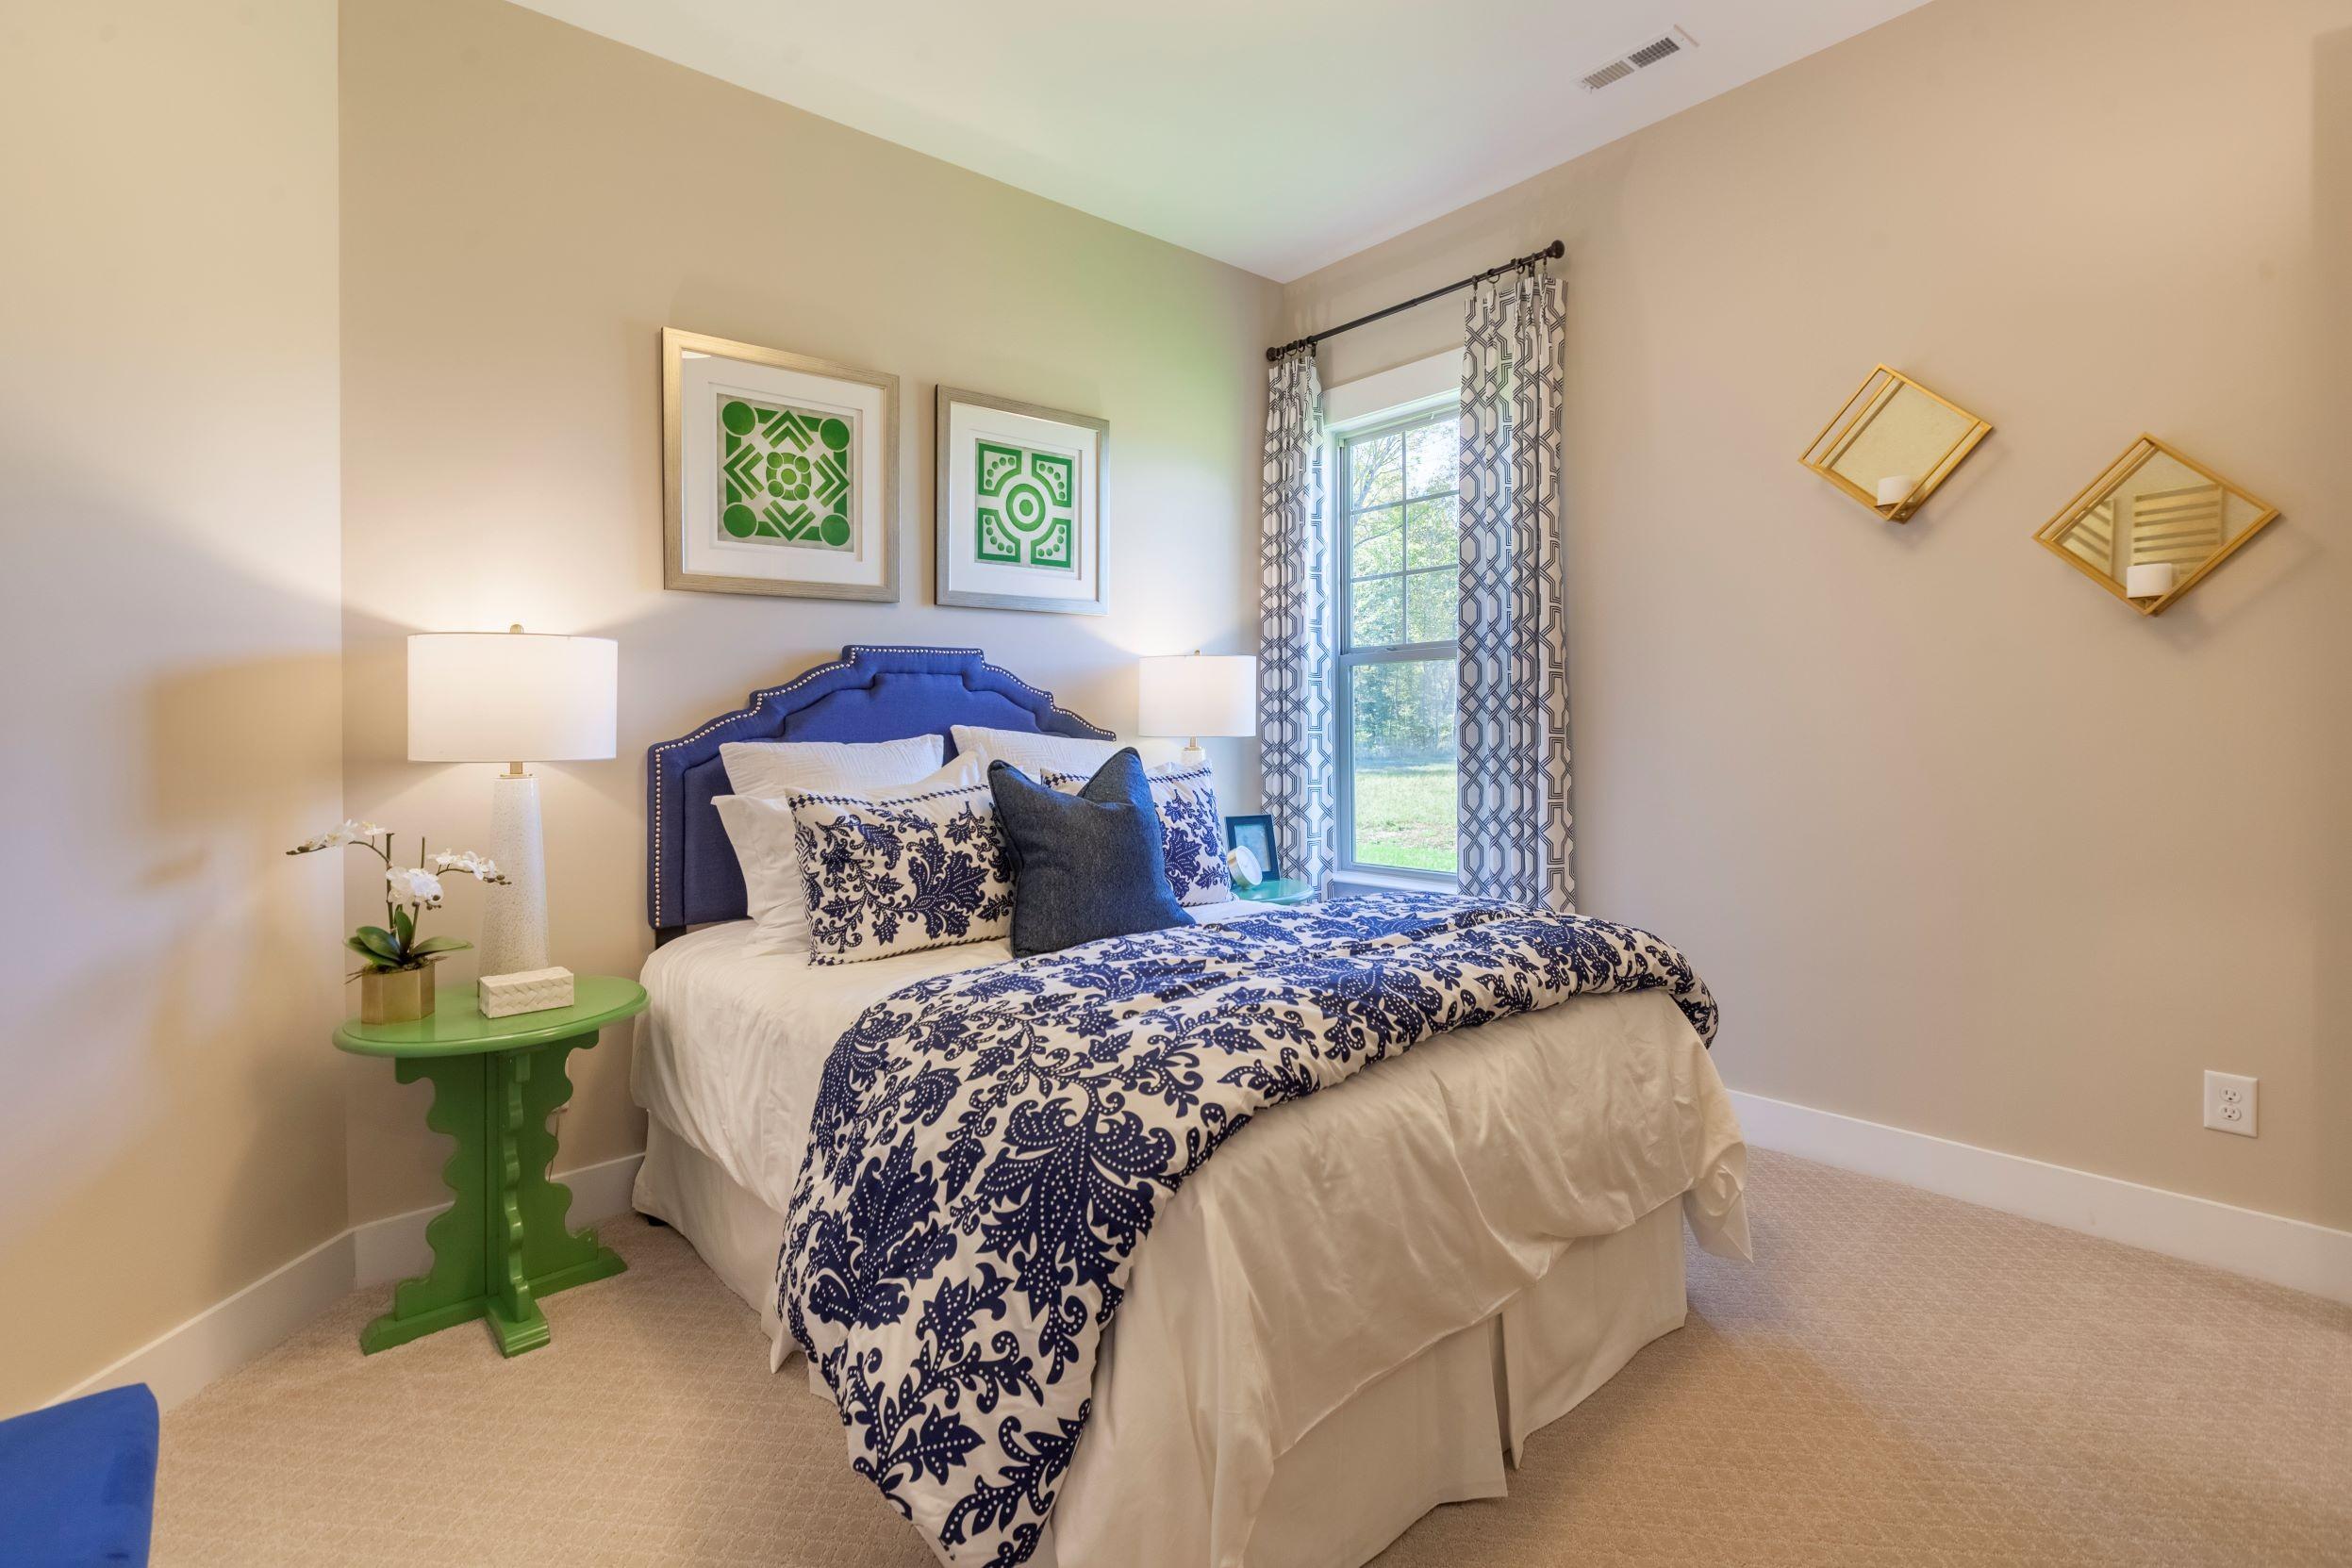 Casalino Whitmore Bedroom